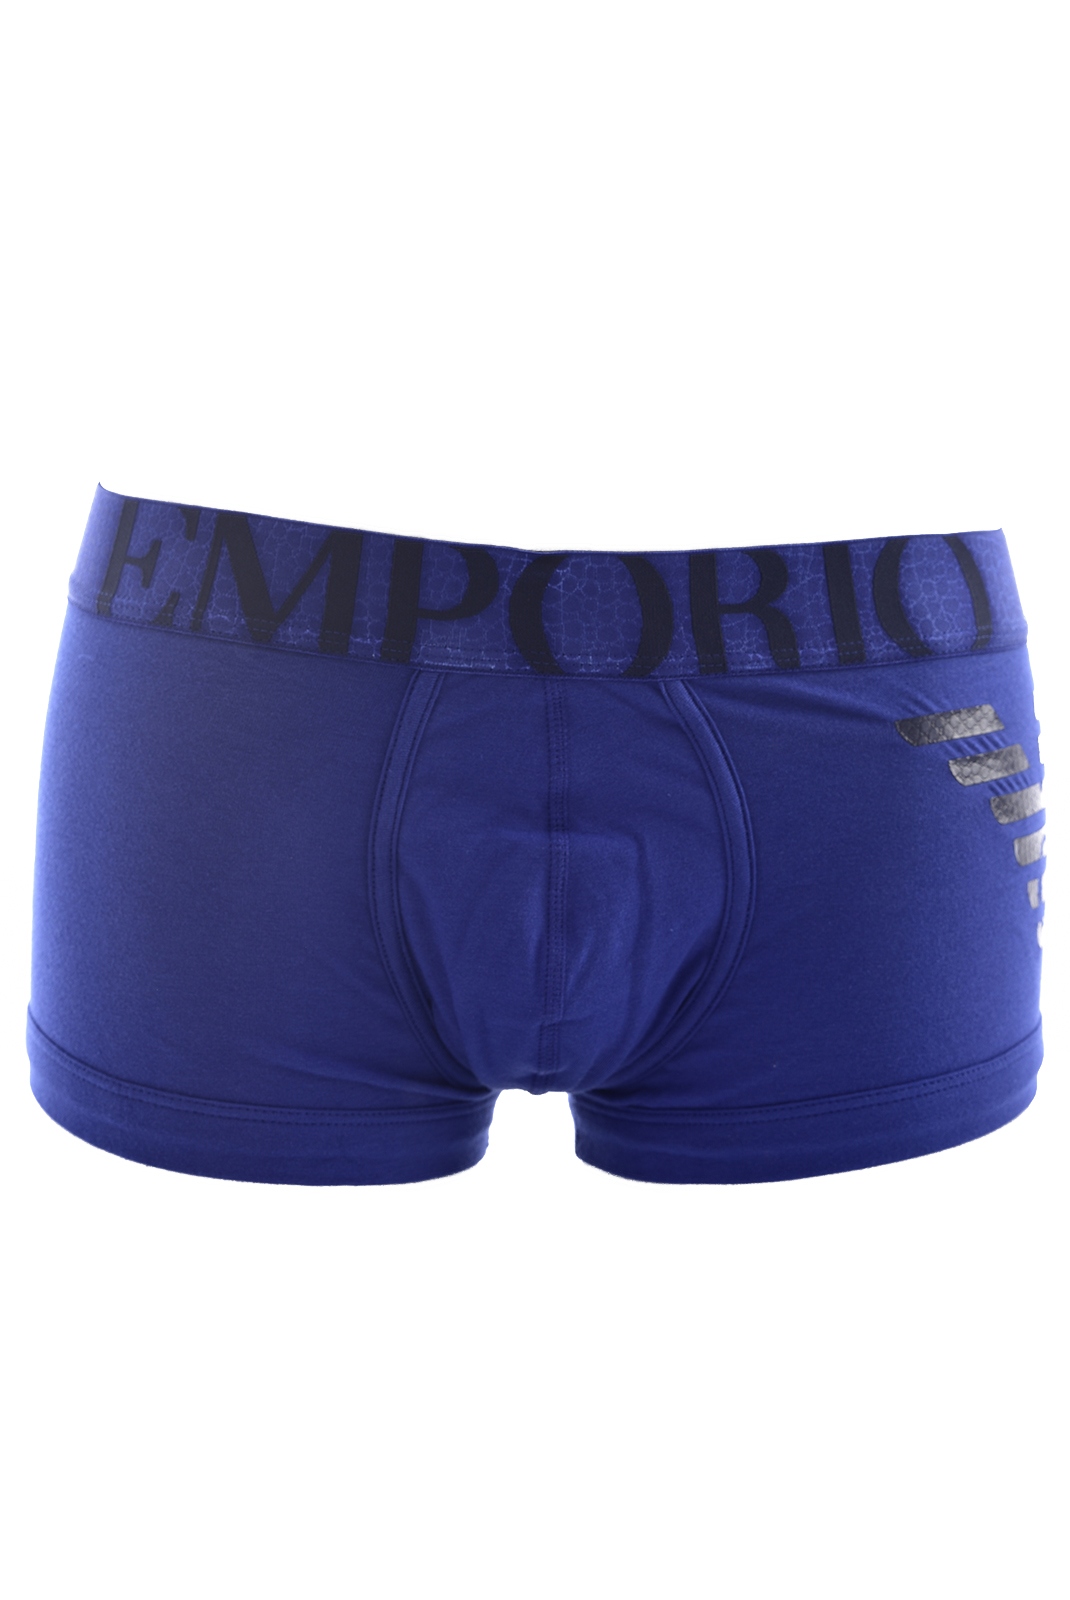 Slips-Caleçons  Emporio armani 111866 8A745 23233 MAZARINE